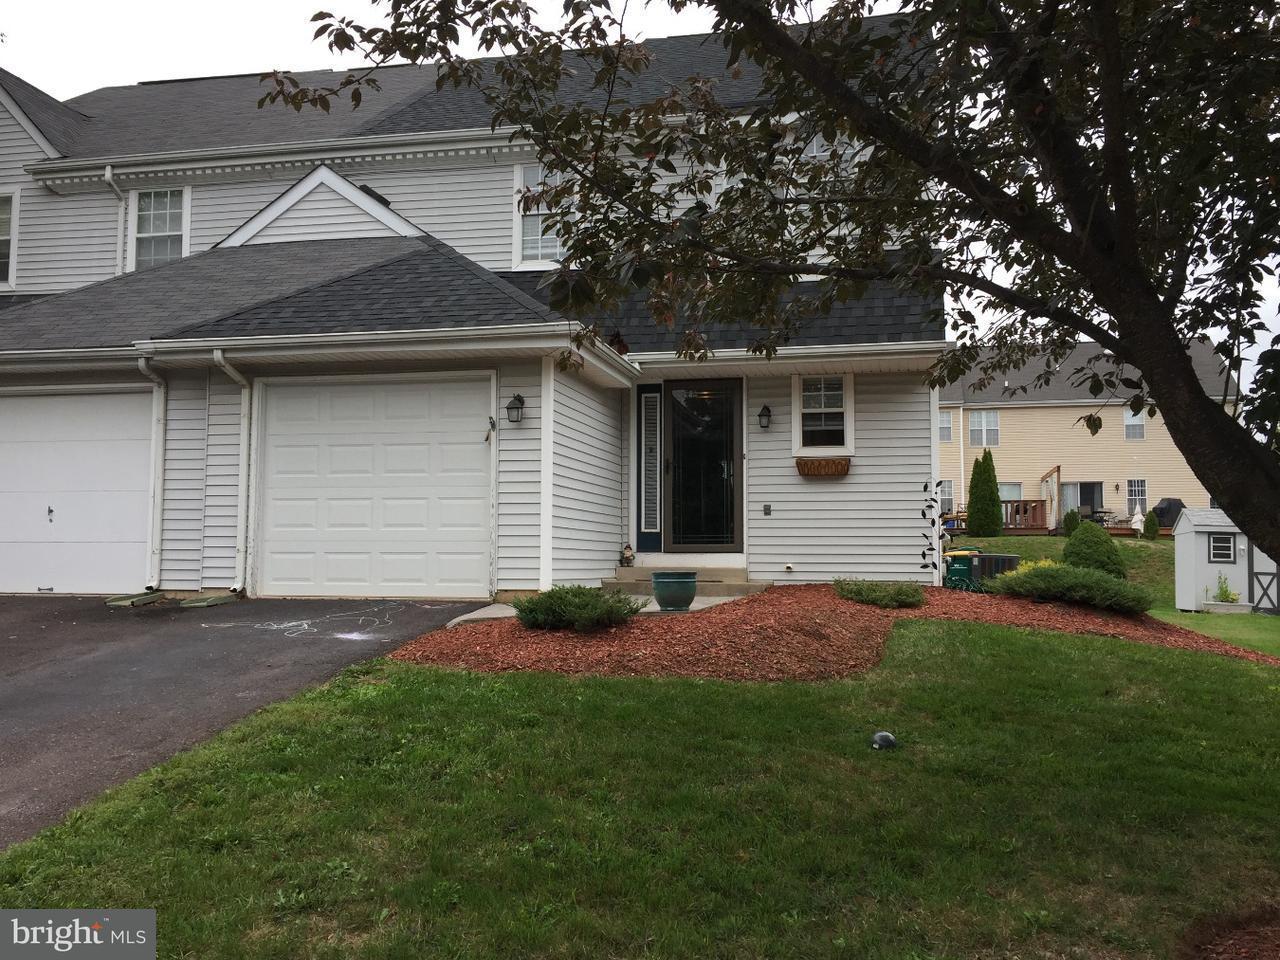 Townhouse for Rent at 190 AZALEA Circle Royersford, Pennsylvania 19468 United States